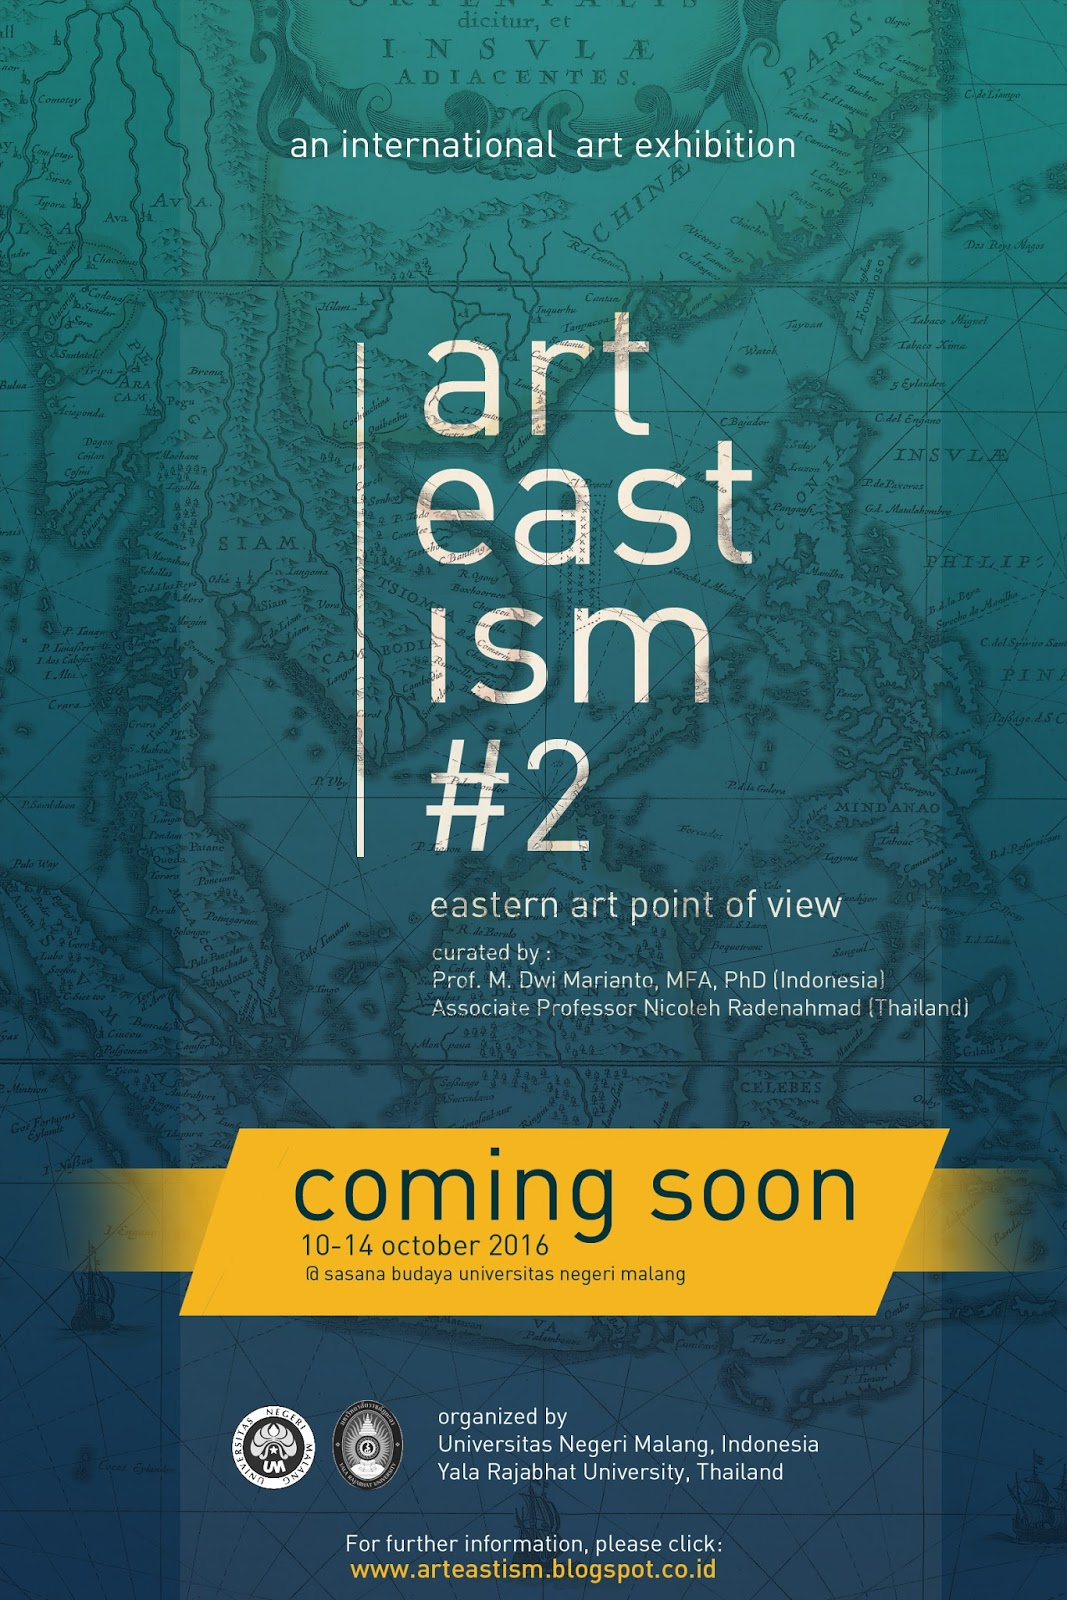 arteastism: Undangan Pameran Seni Rupa ArtEastIsm#2